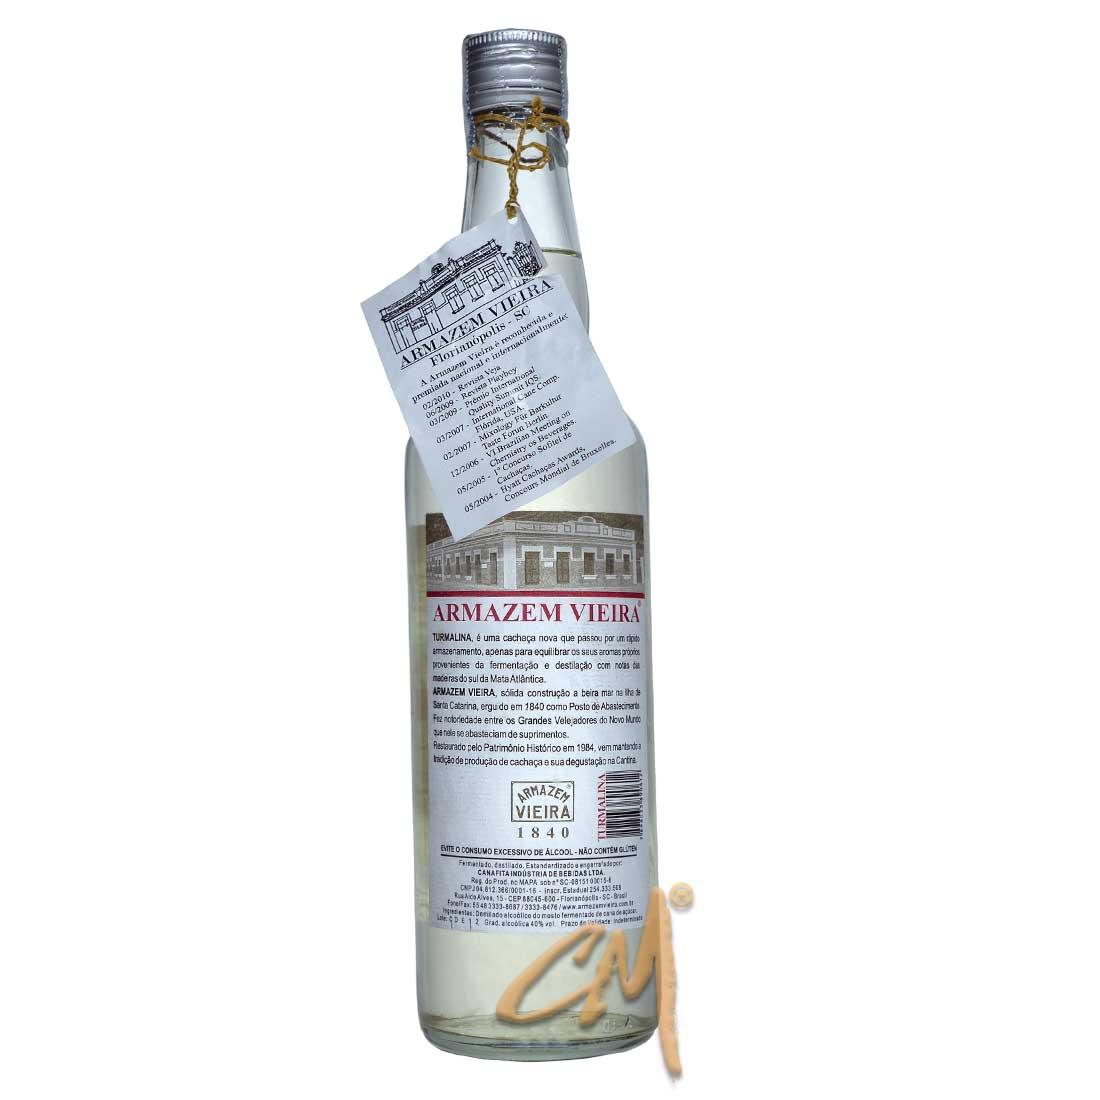 Cachaça Armazem Vieira Turmalina 670 ml (Florianópolis - SC)